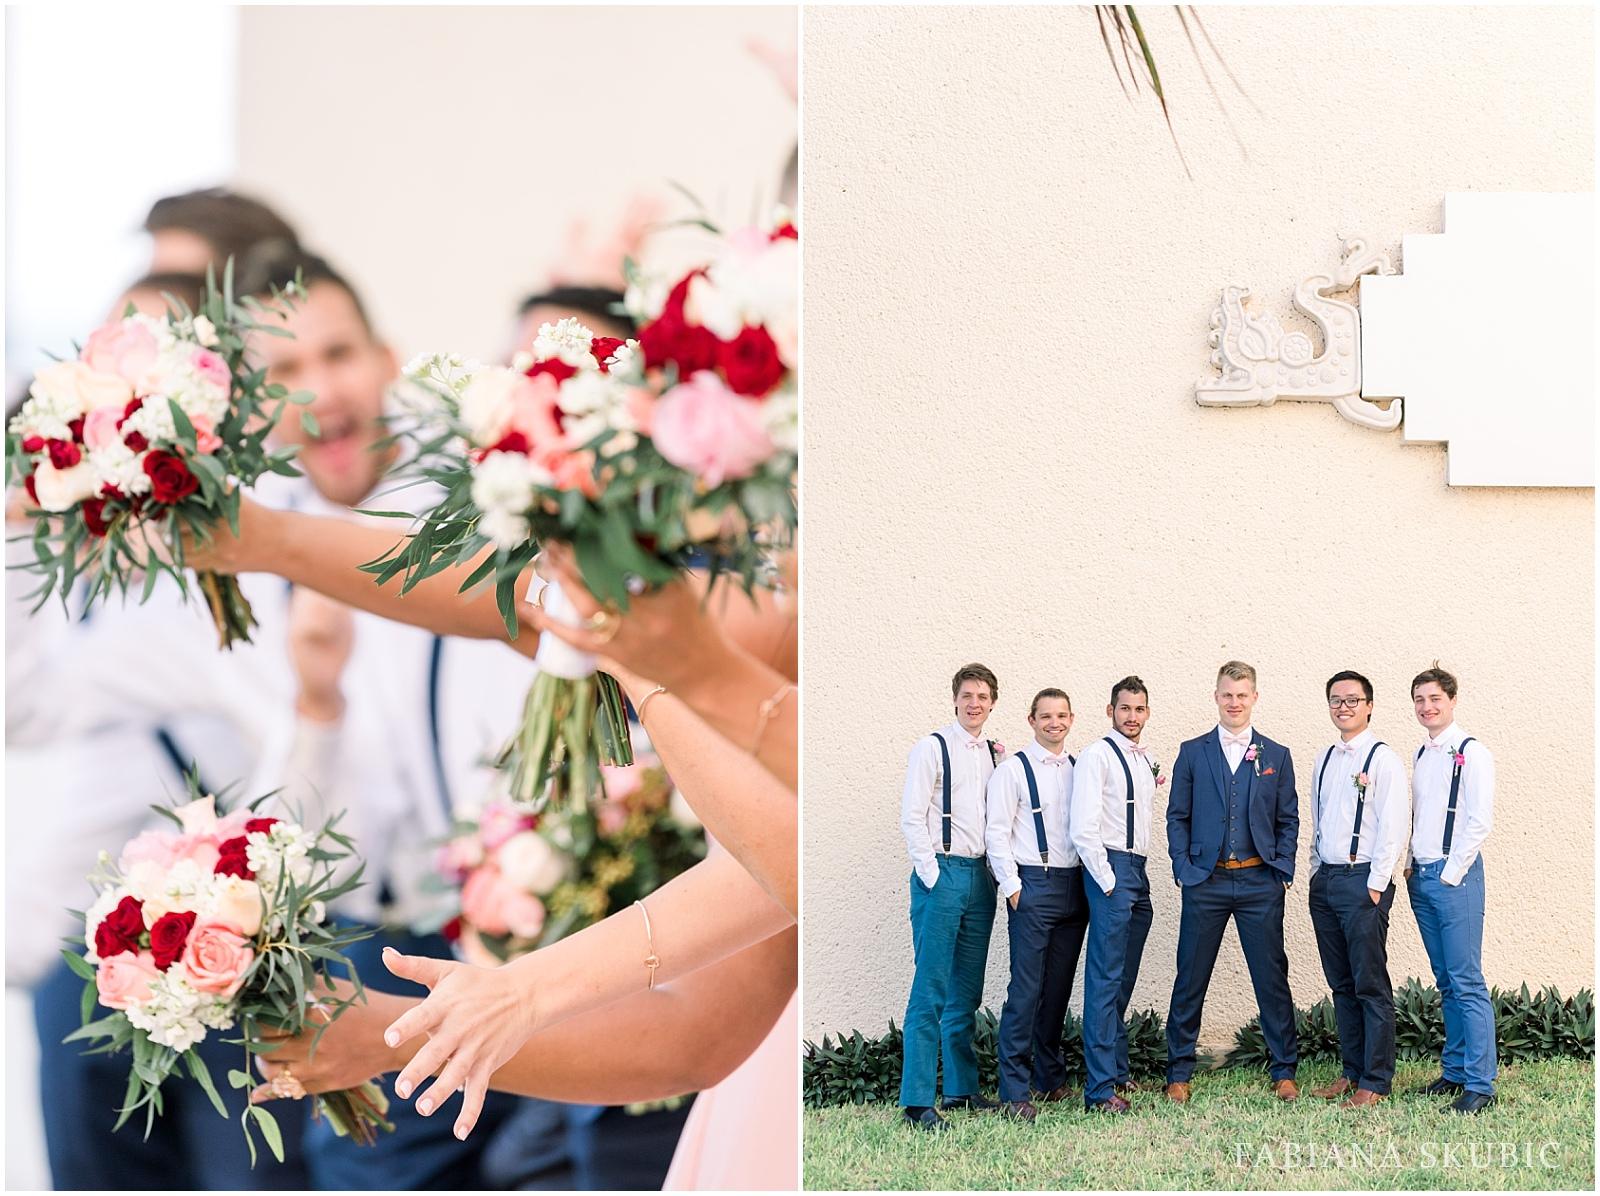 TJ_Now_Sapphire_Riviera_Cancun_Mexico_Wedding_Photos_0218.jpg